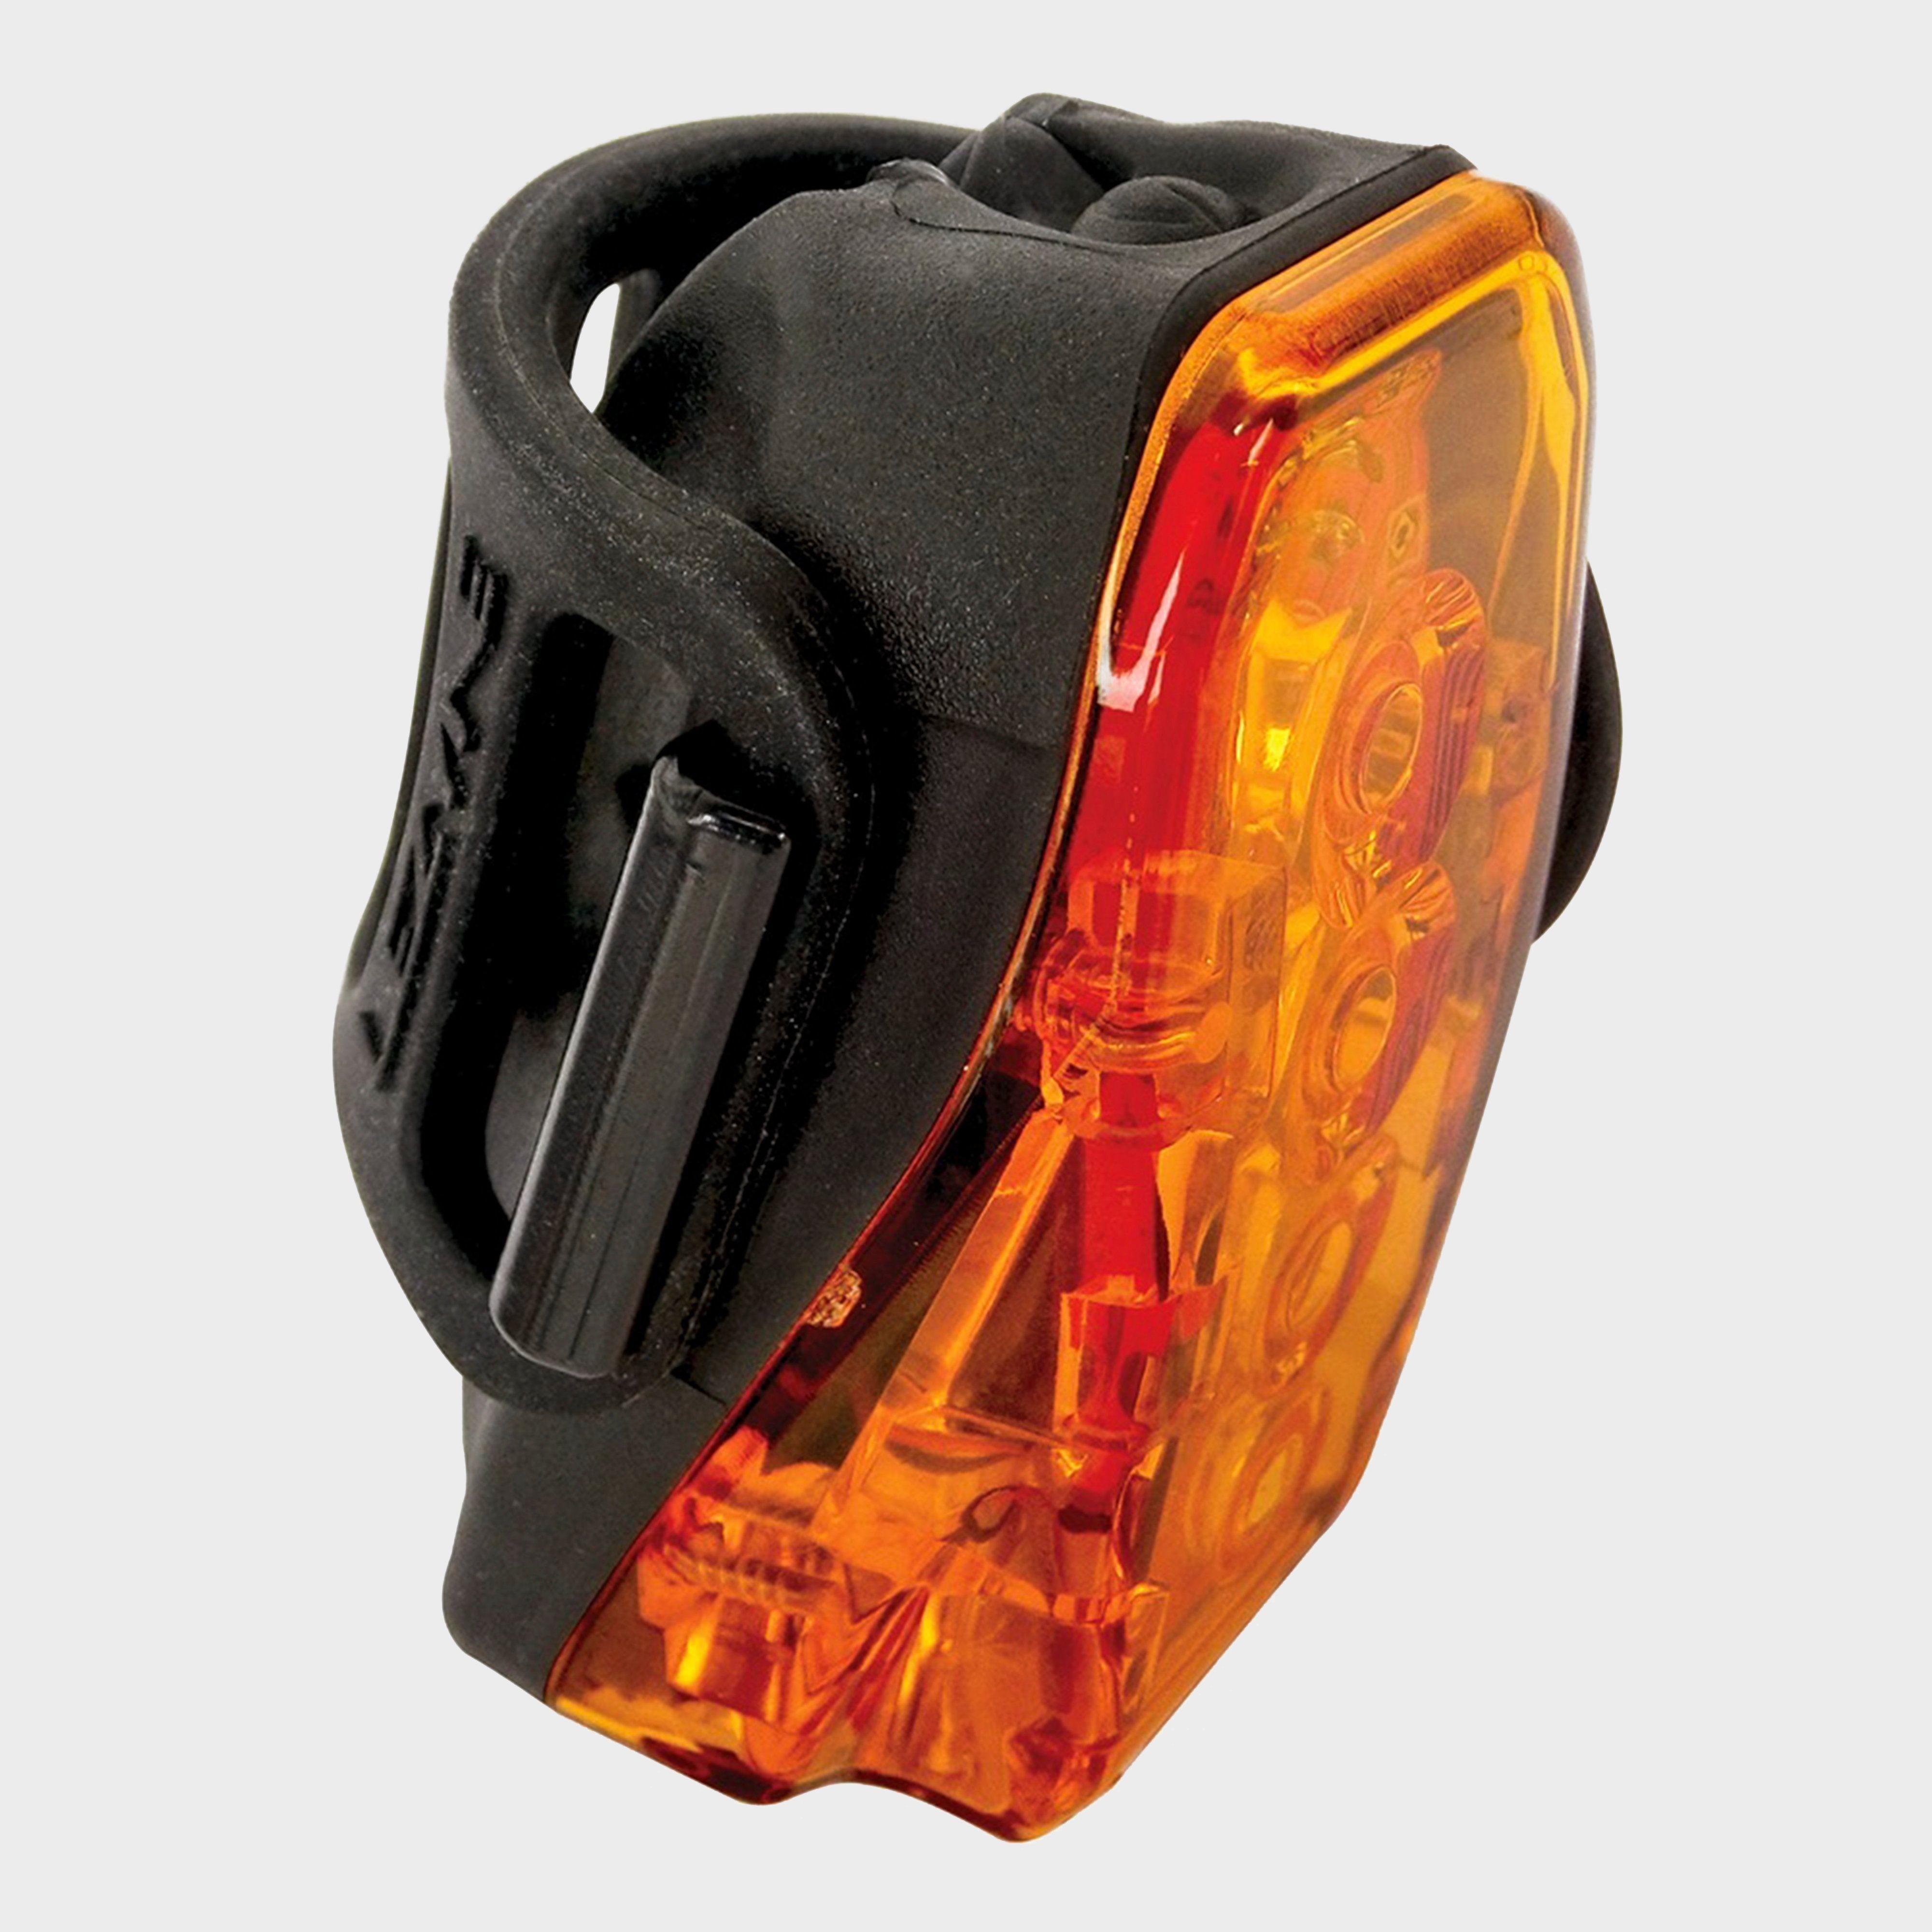 LEZYNE Laser Drive Rear Light